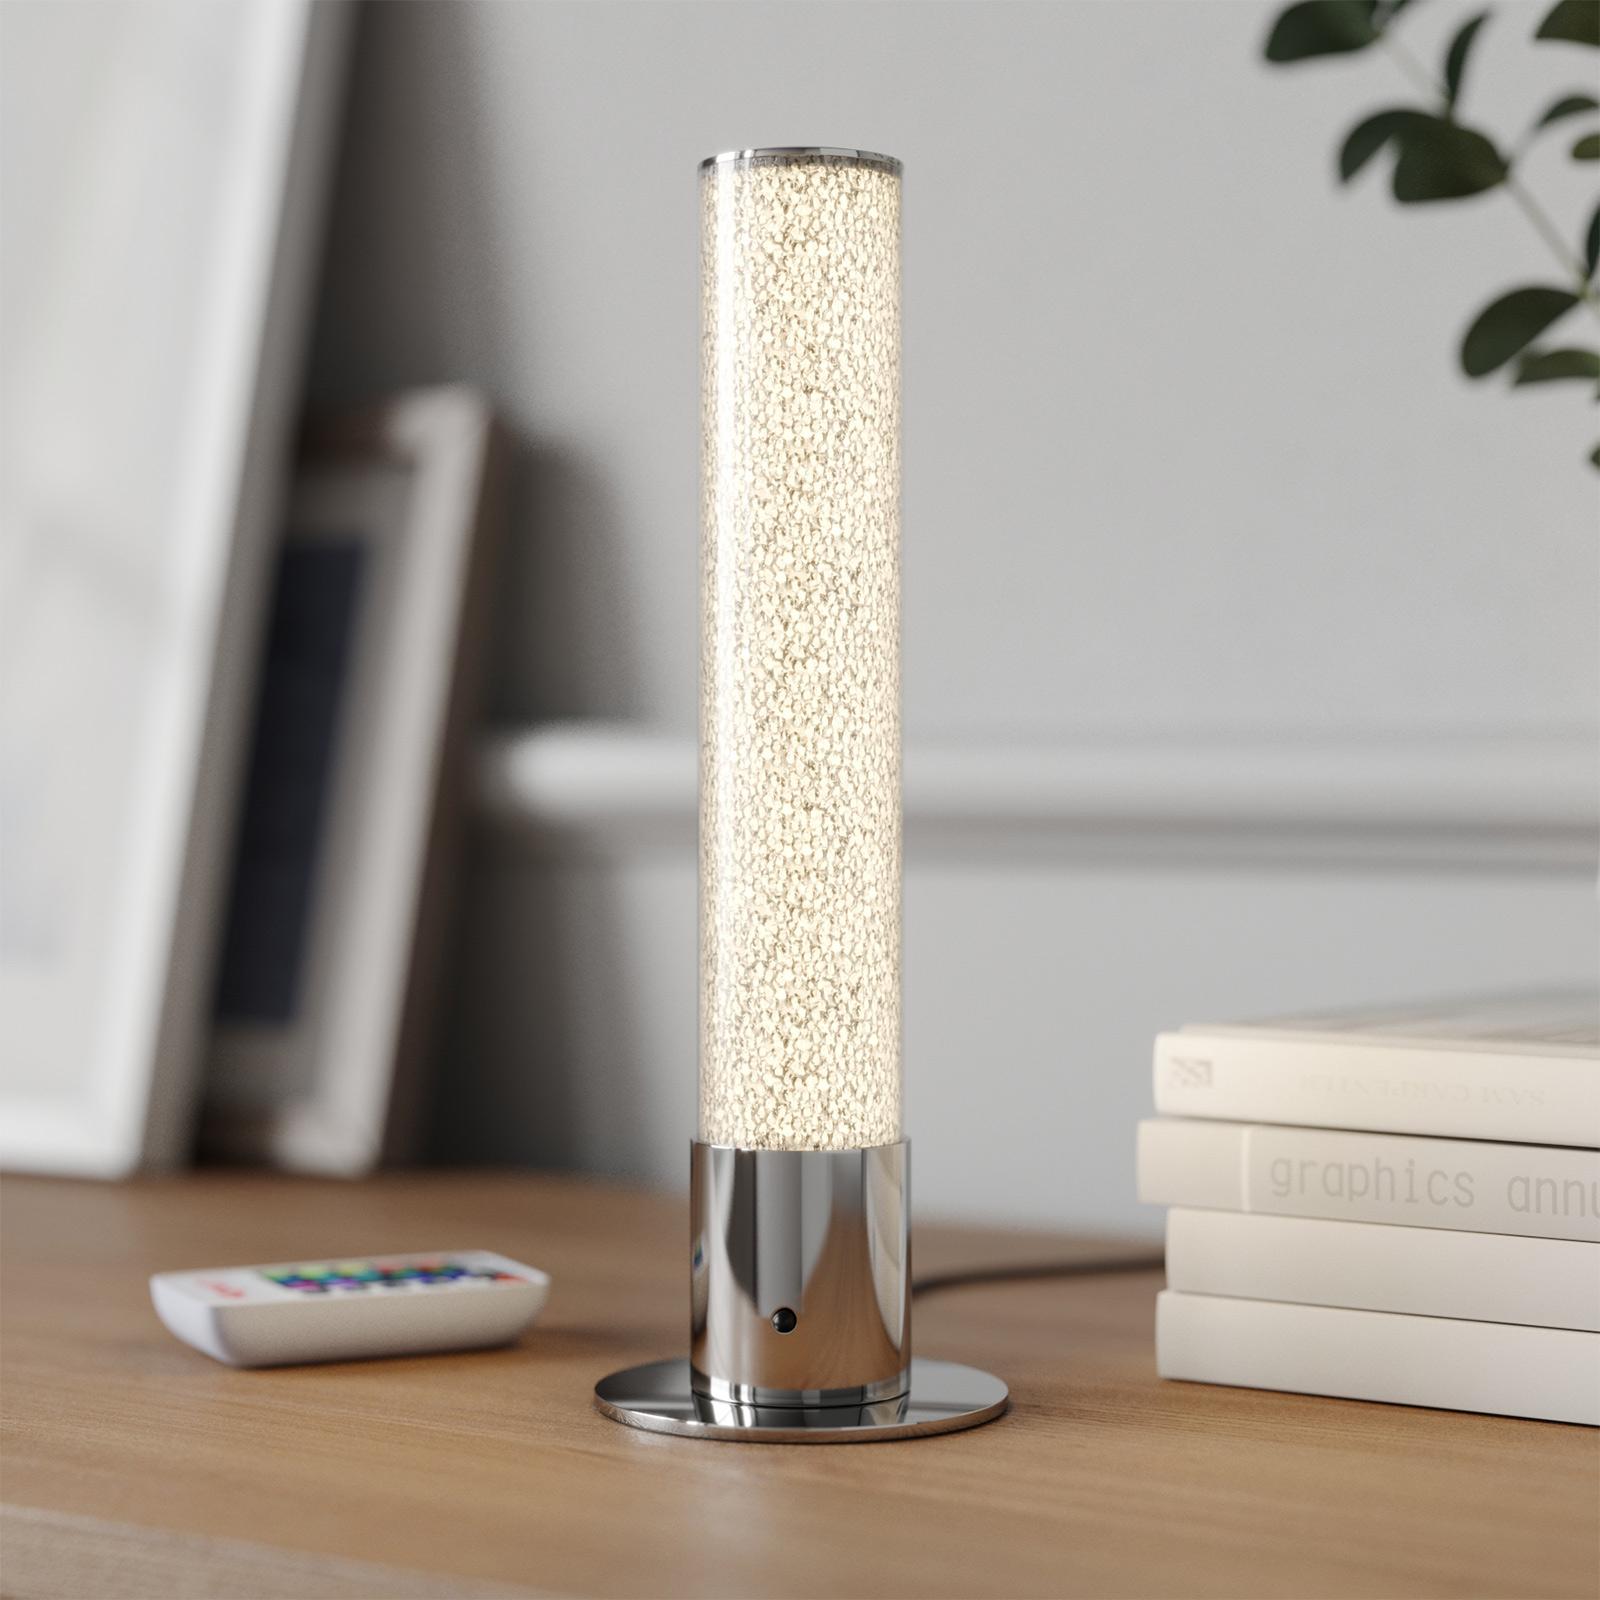 LED tafellamp Fria, cilinder, RGB, afstandsbed.